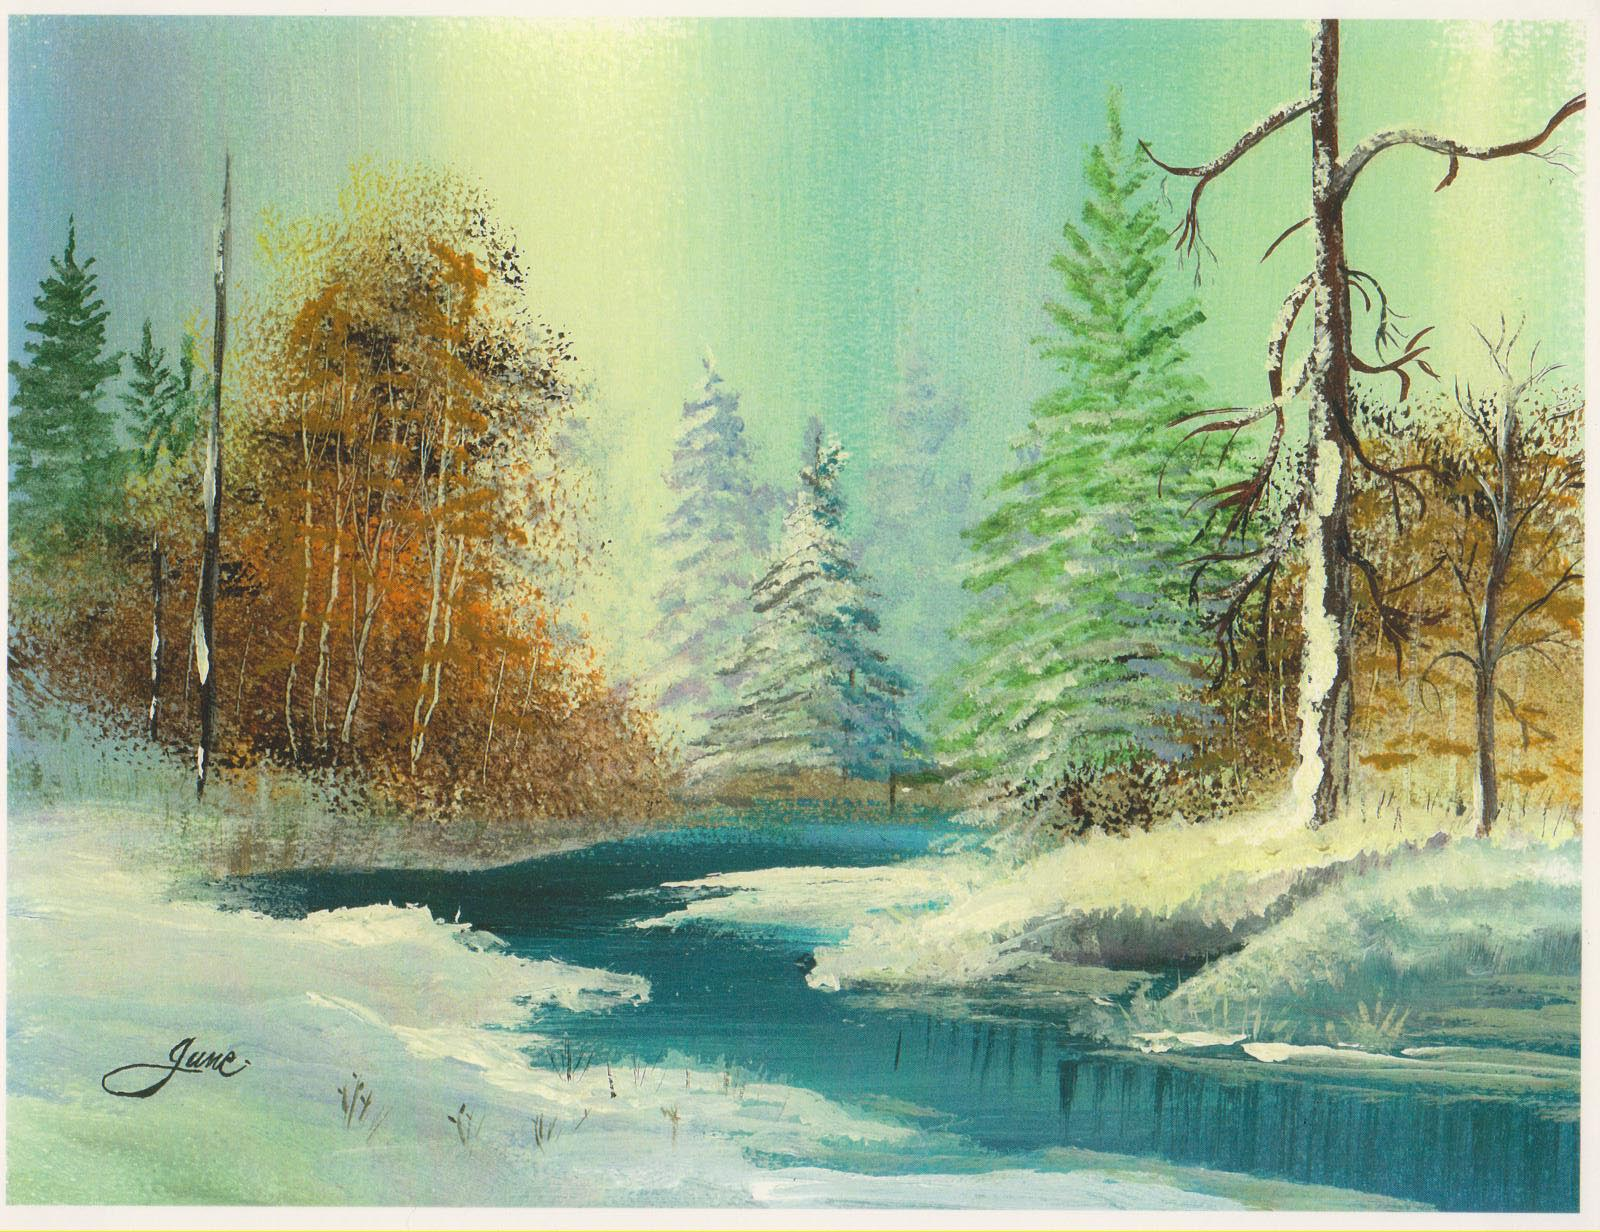 Watercolor painting artists websites - Artist Spotlight June Smith